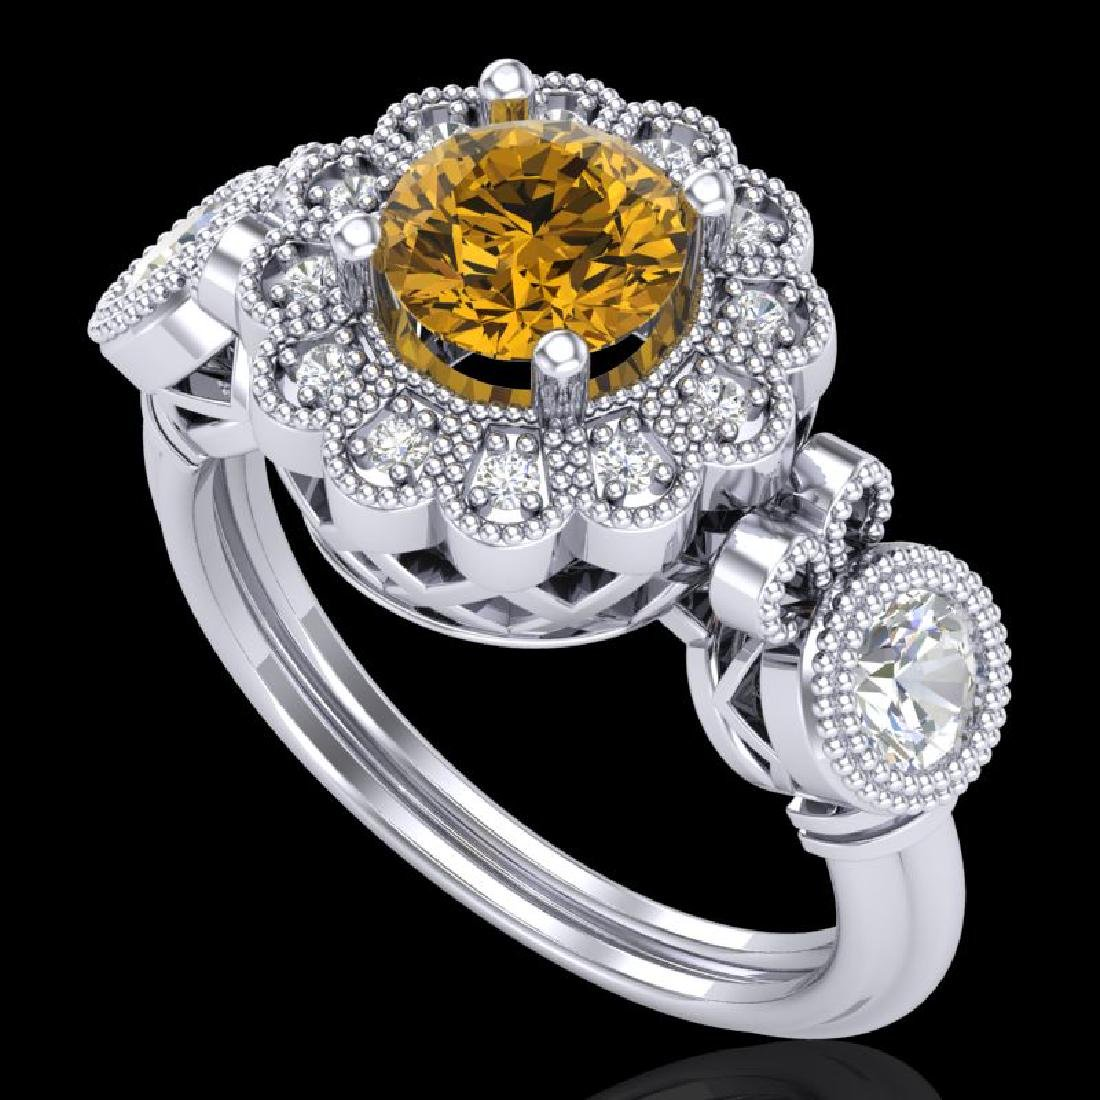 1.5 CTW Intense Fancy Yellow Diamond Art Deco 3 Stone